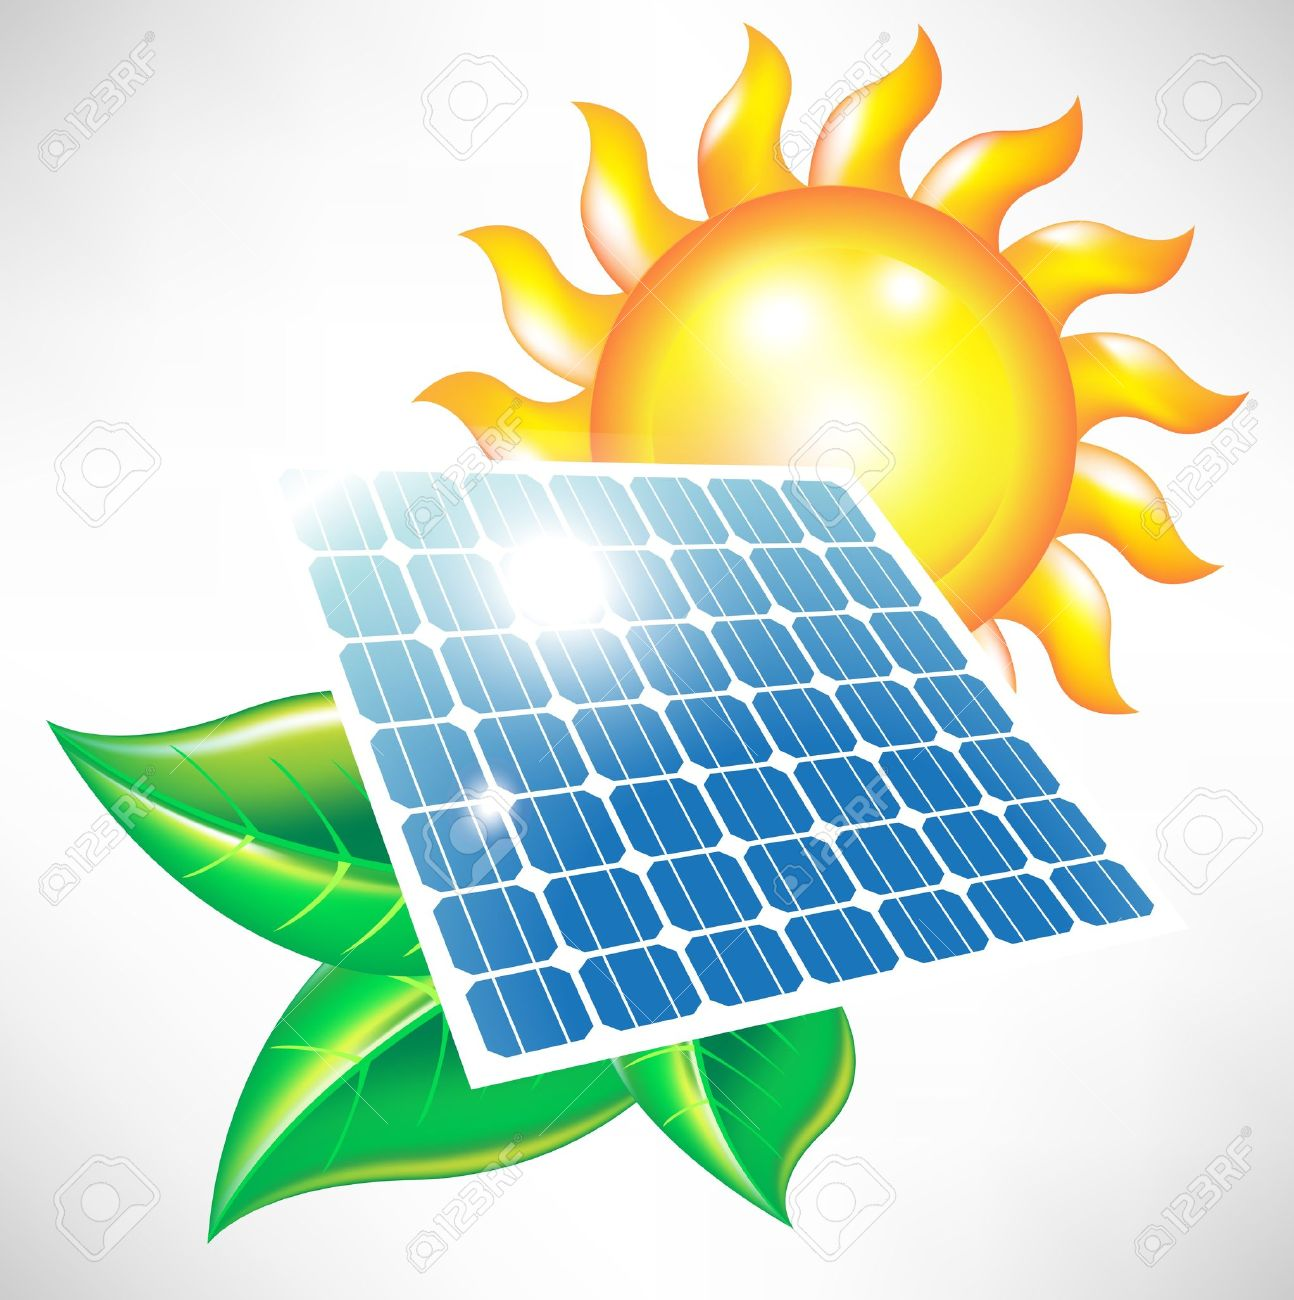 solar energy panel with sun and leaves alternative energy icon rh 123rf com solar energy free clipart solar energy free clipart